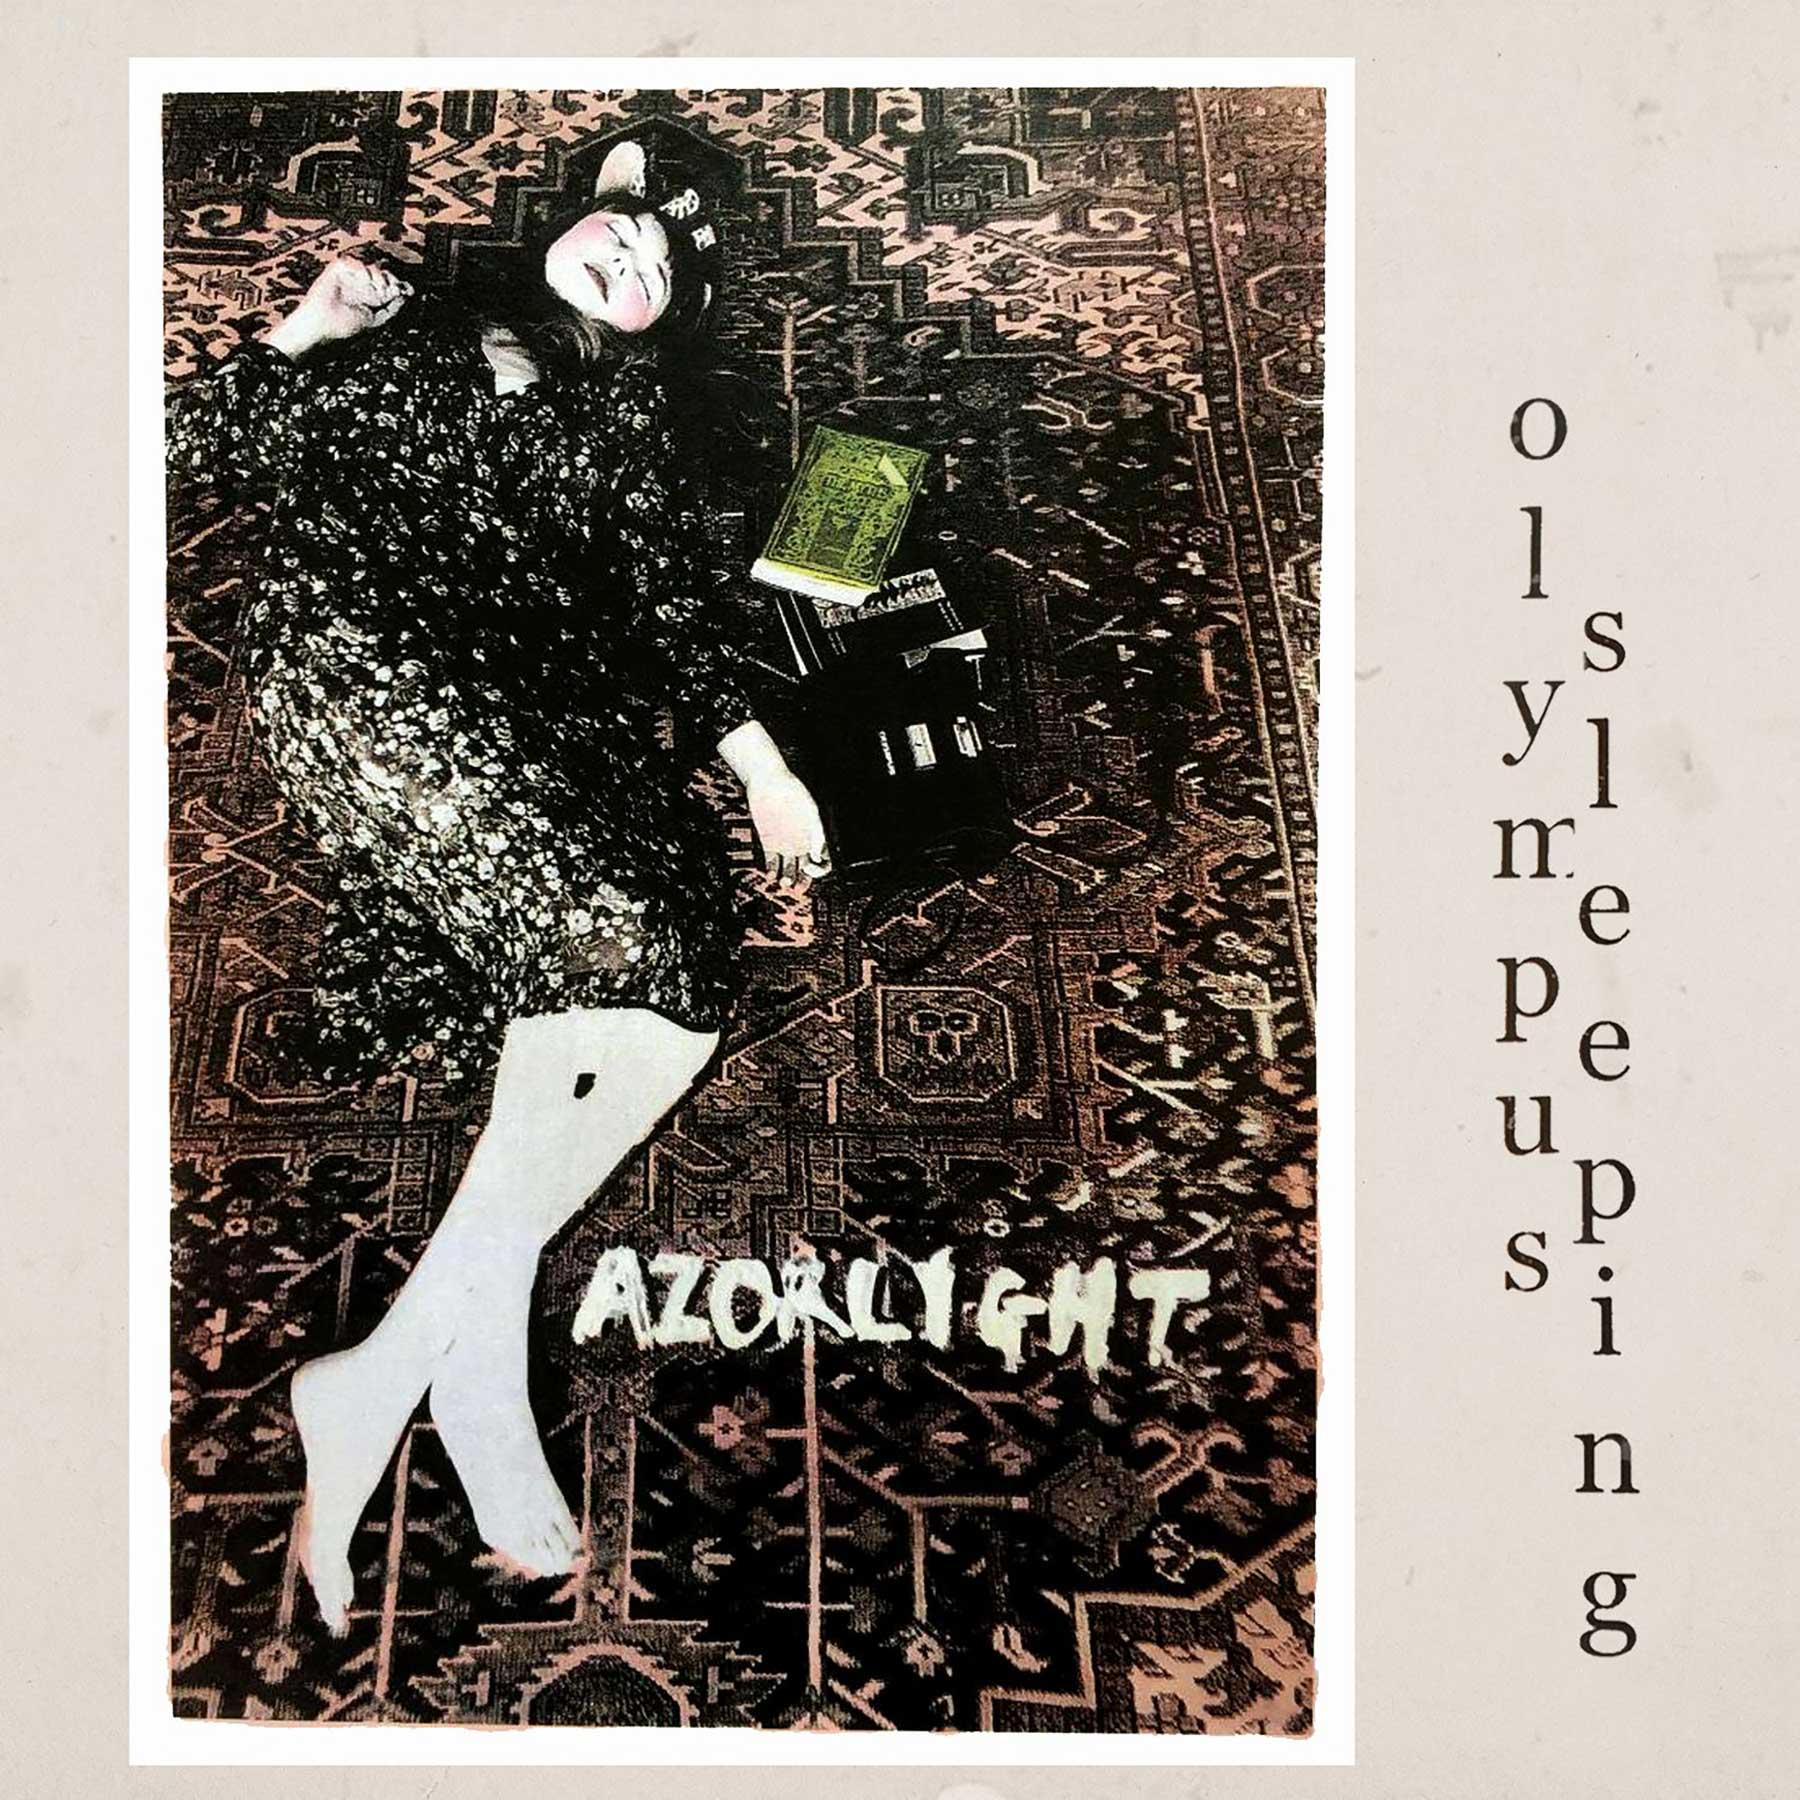 Razorlight sind mit vier neuen Songs zurück razorlight-albumcover-olympic-sleeping